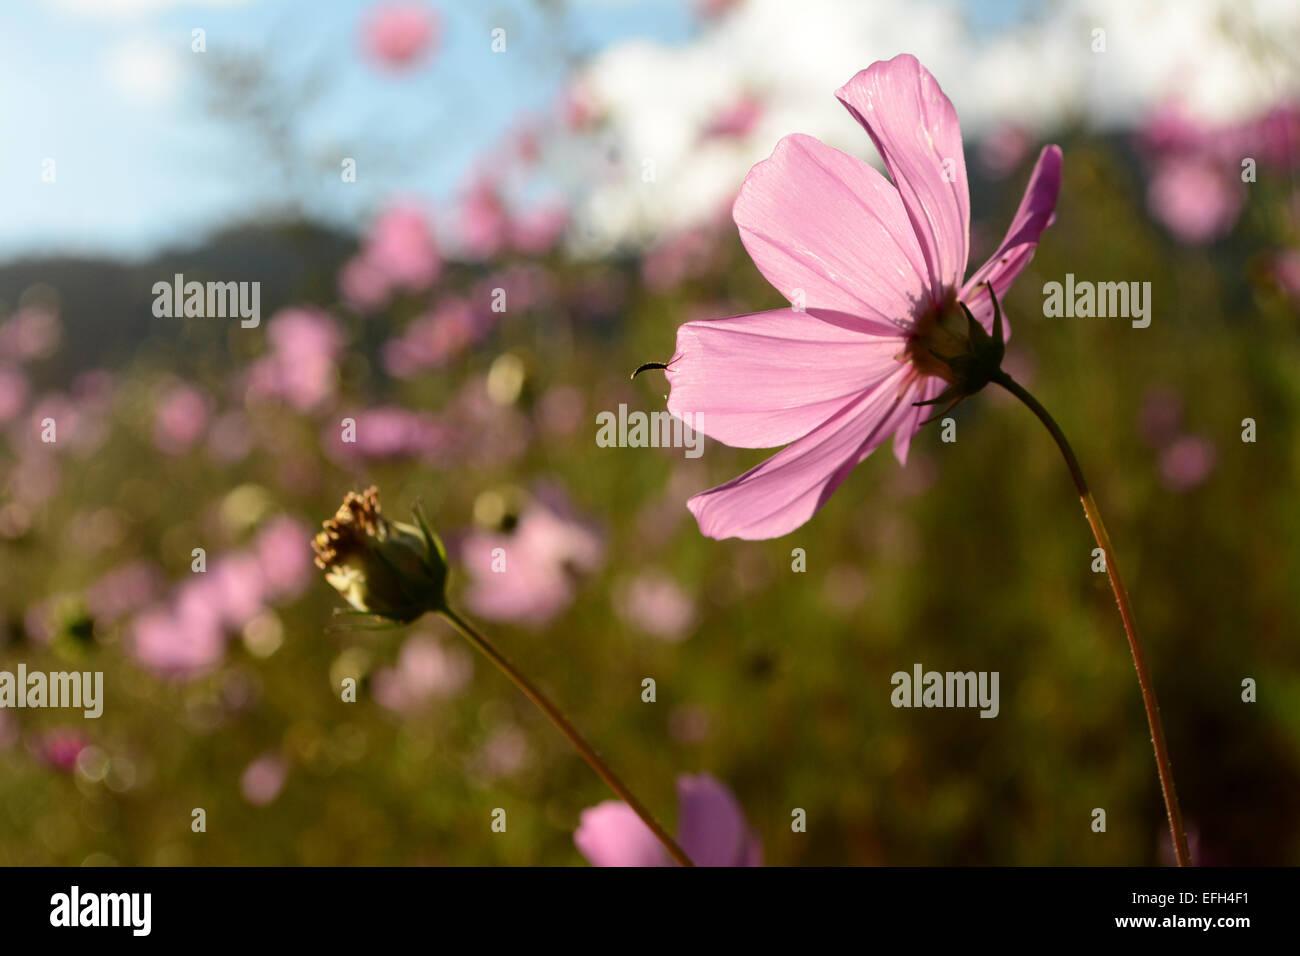 Wild Flower Bhutan Pink Stock Photos Wild Flower Bhutan Pink Stock